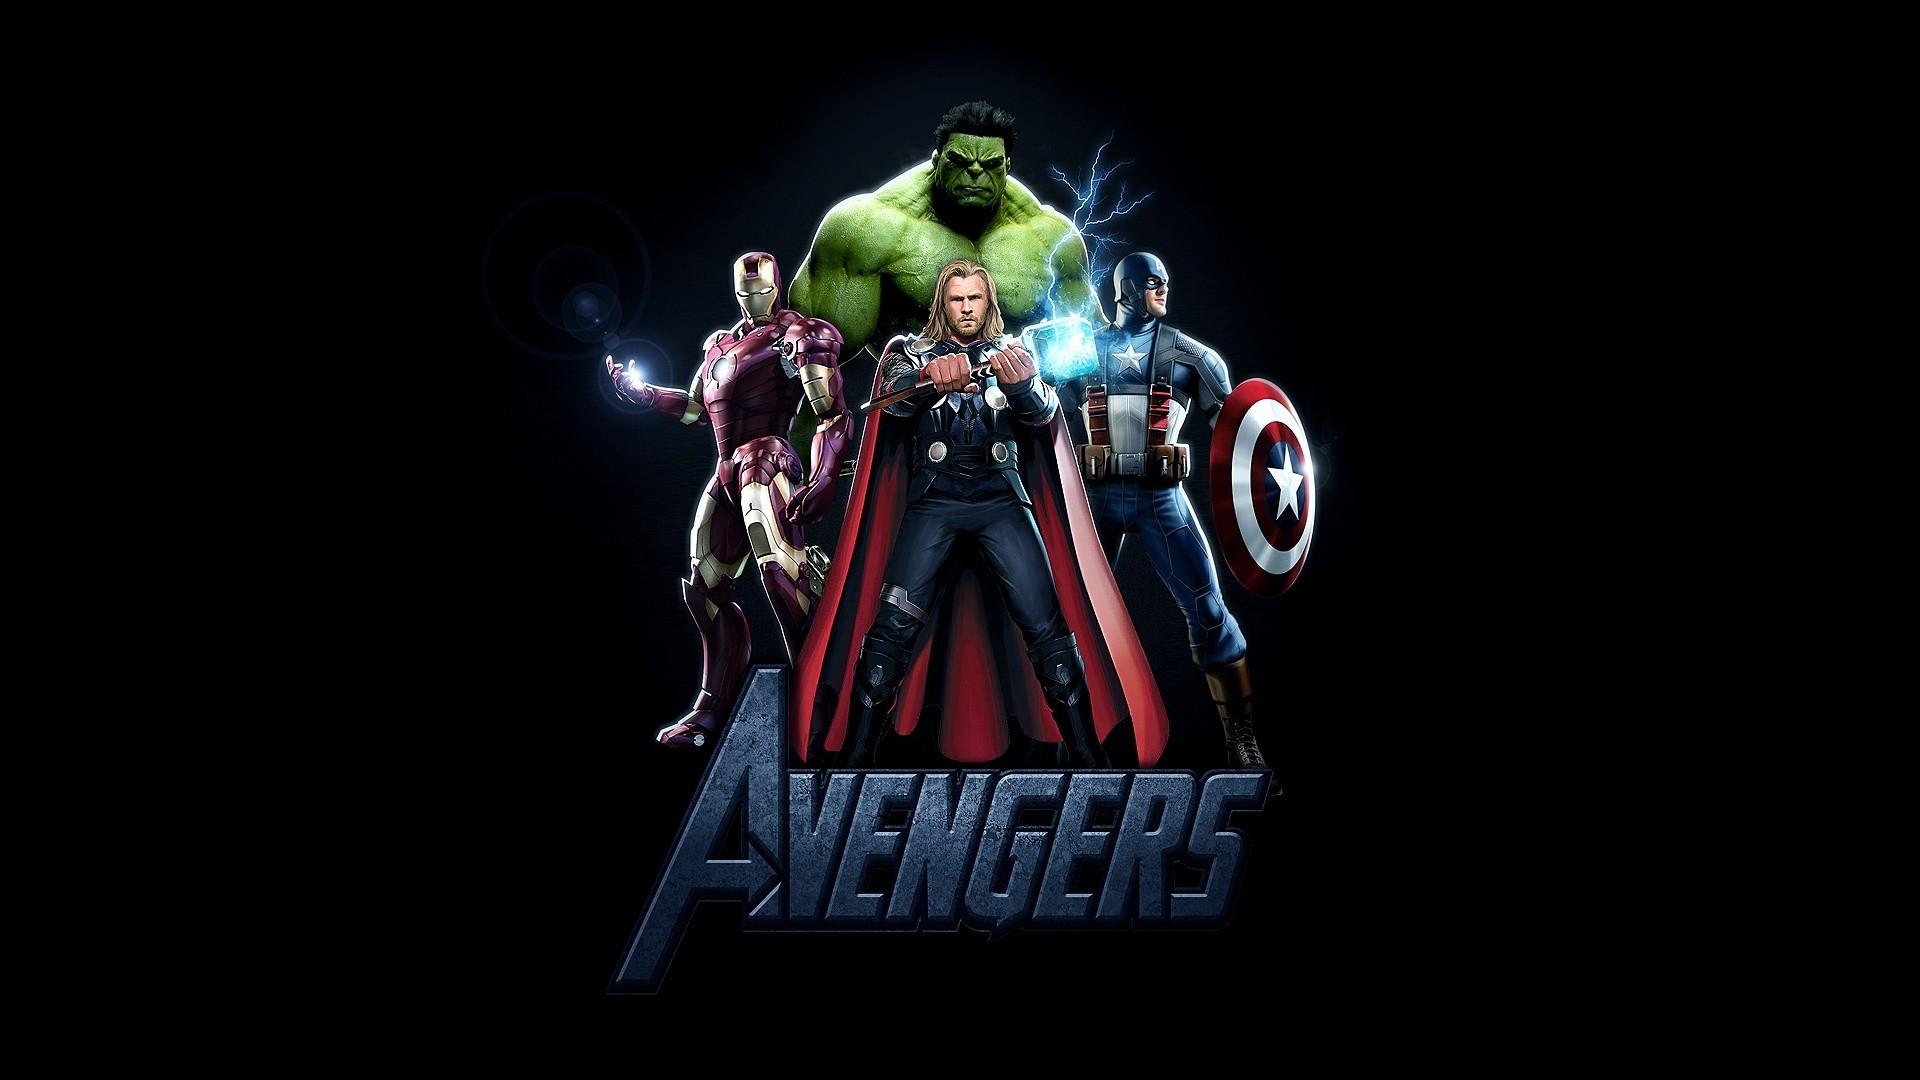 Avengers movie logo HD wallpapers.